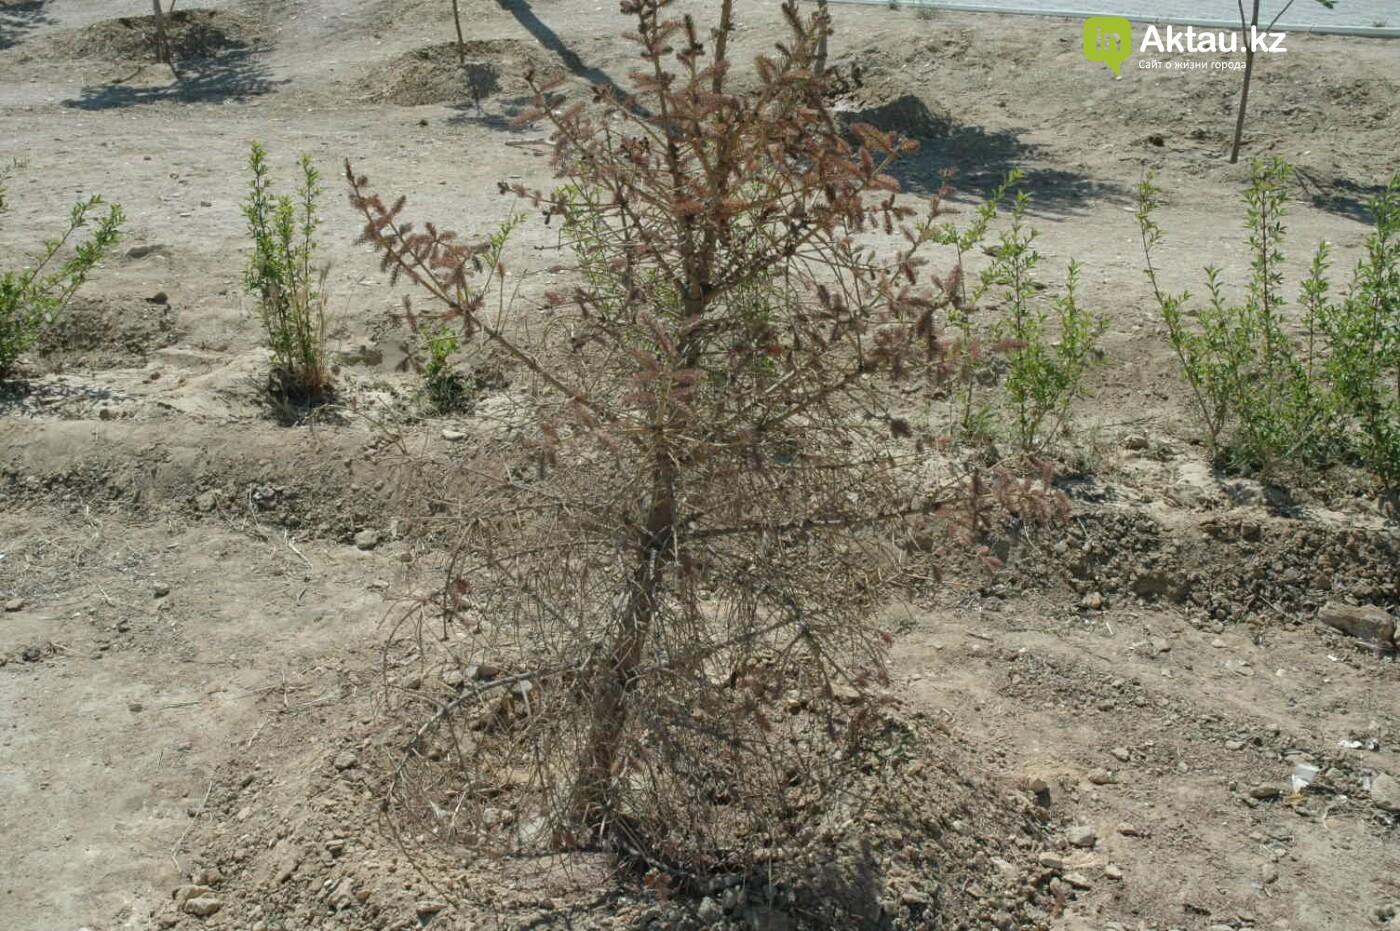 Погибшие от засухи и обезвоживания в Актау исчисляются десятками (ФОТО), фото-28